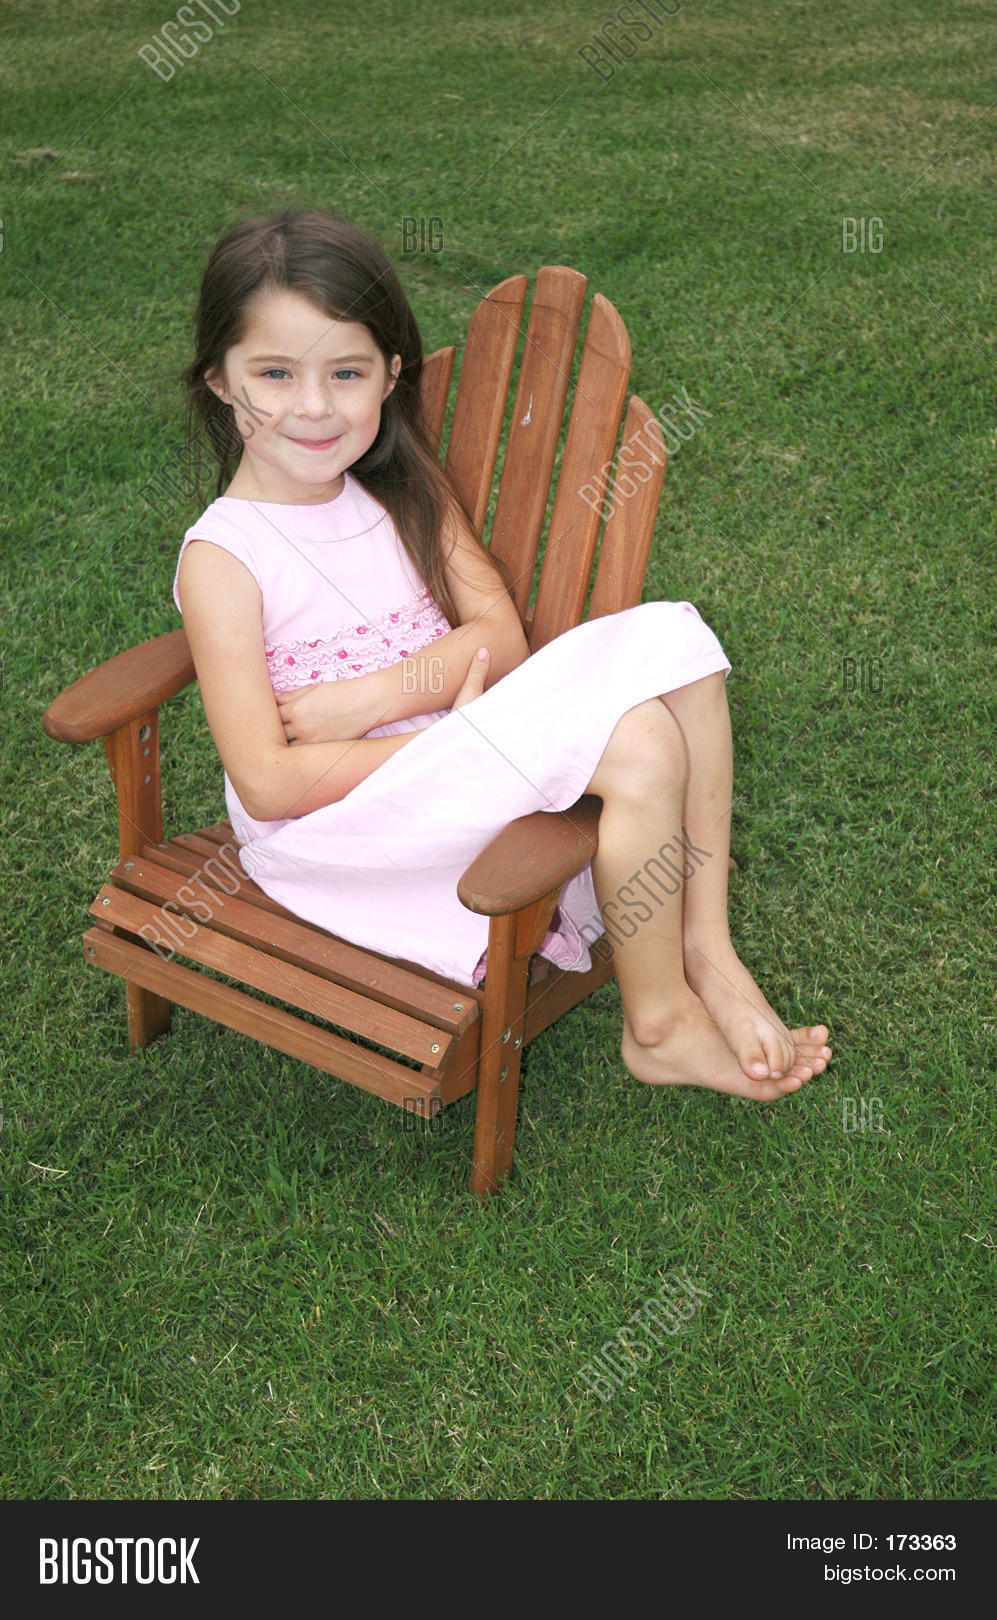 Bare Foot Girl Image & Photo   Bigstock